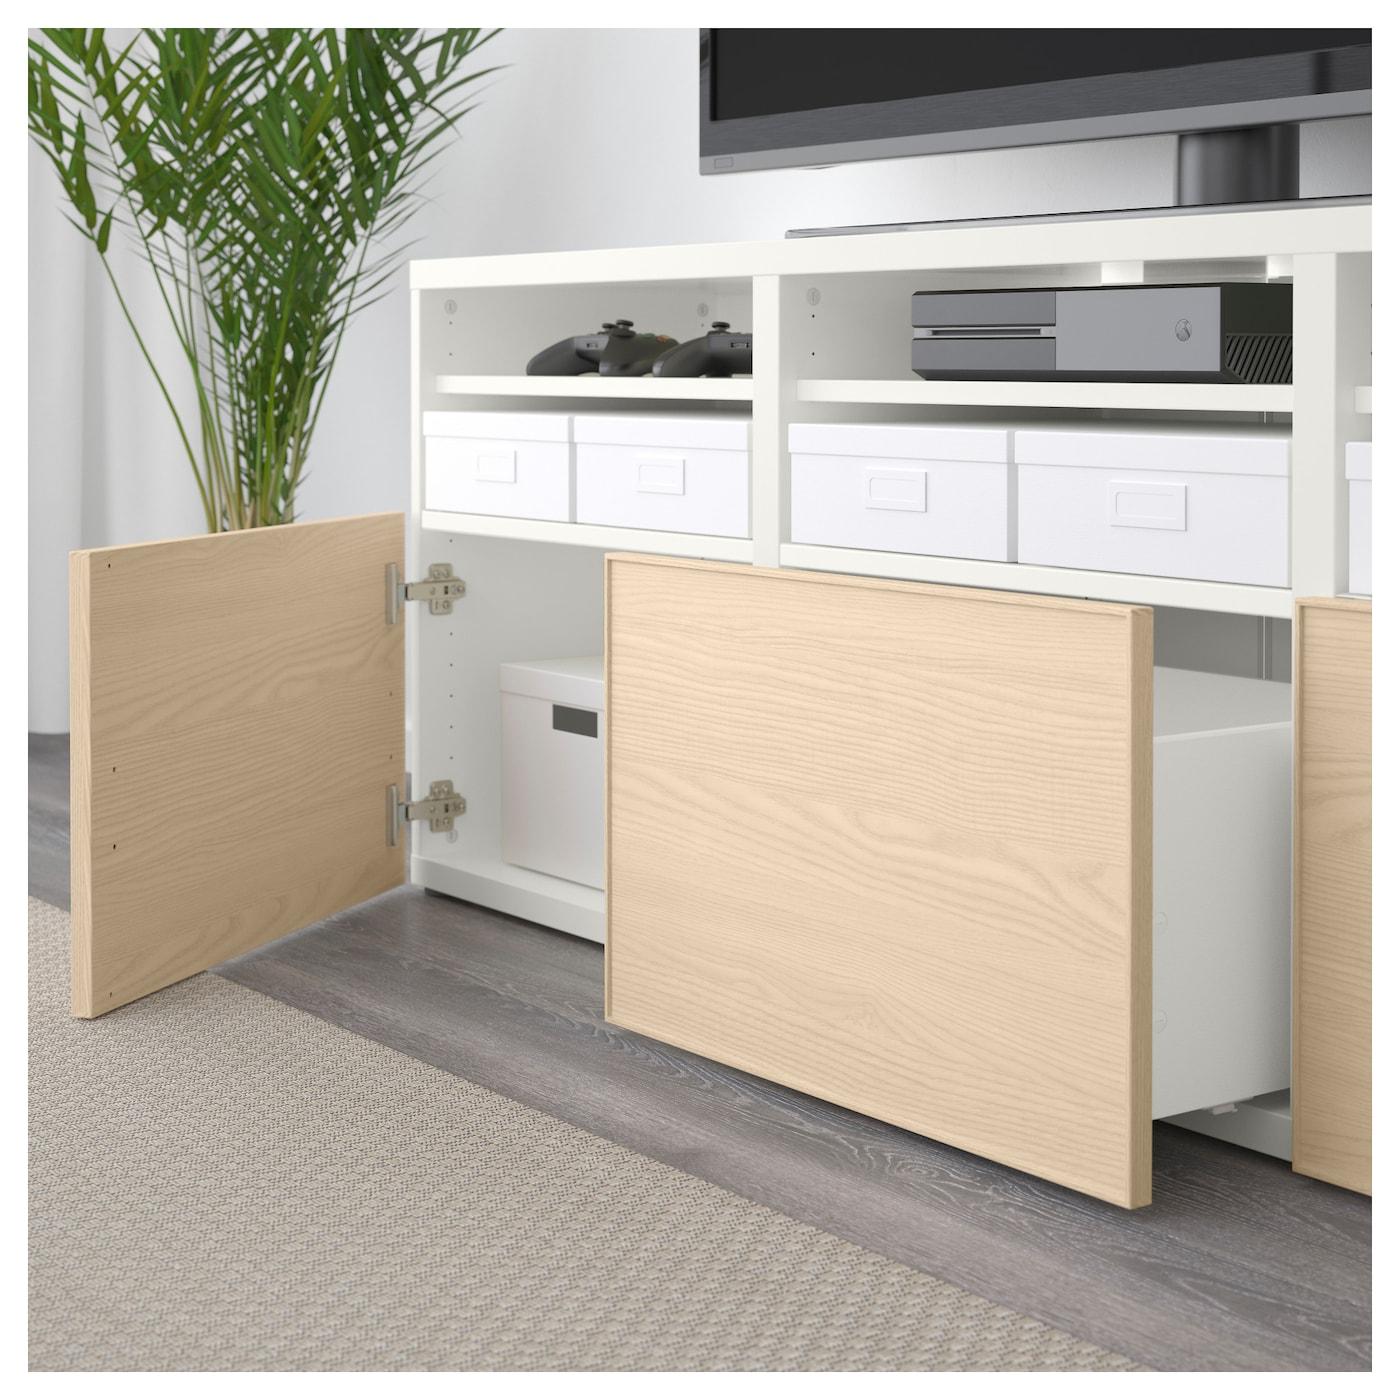 Best mueble tv con almacenaje blanco sindvik inviken chapa fresno 180 x 40 x 192 cm ikea - Muebles almacenaje ikea ...